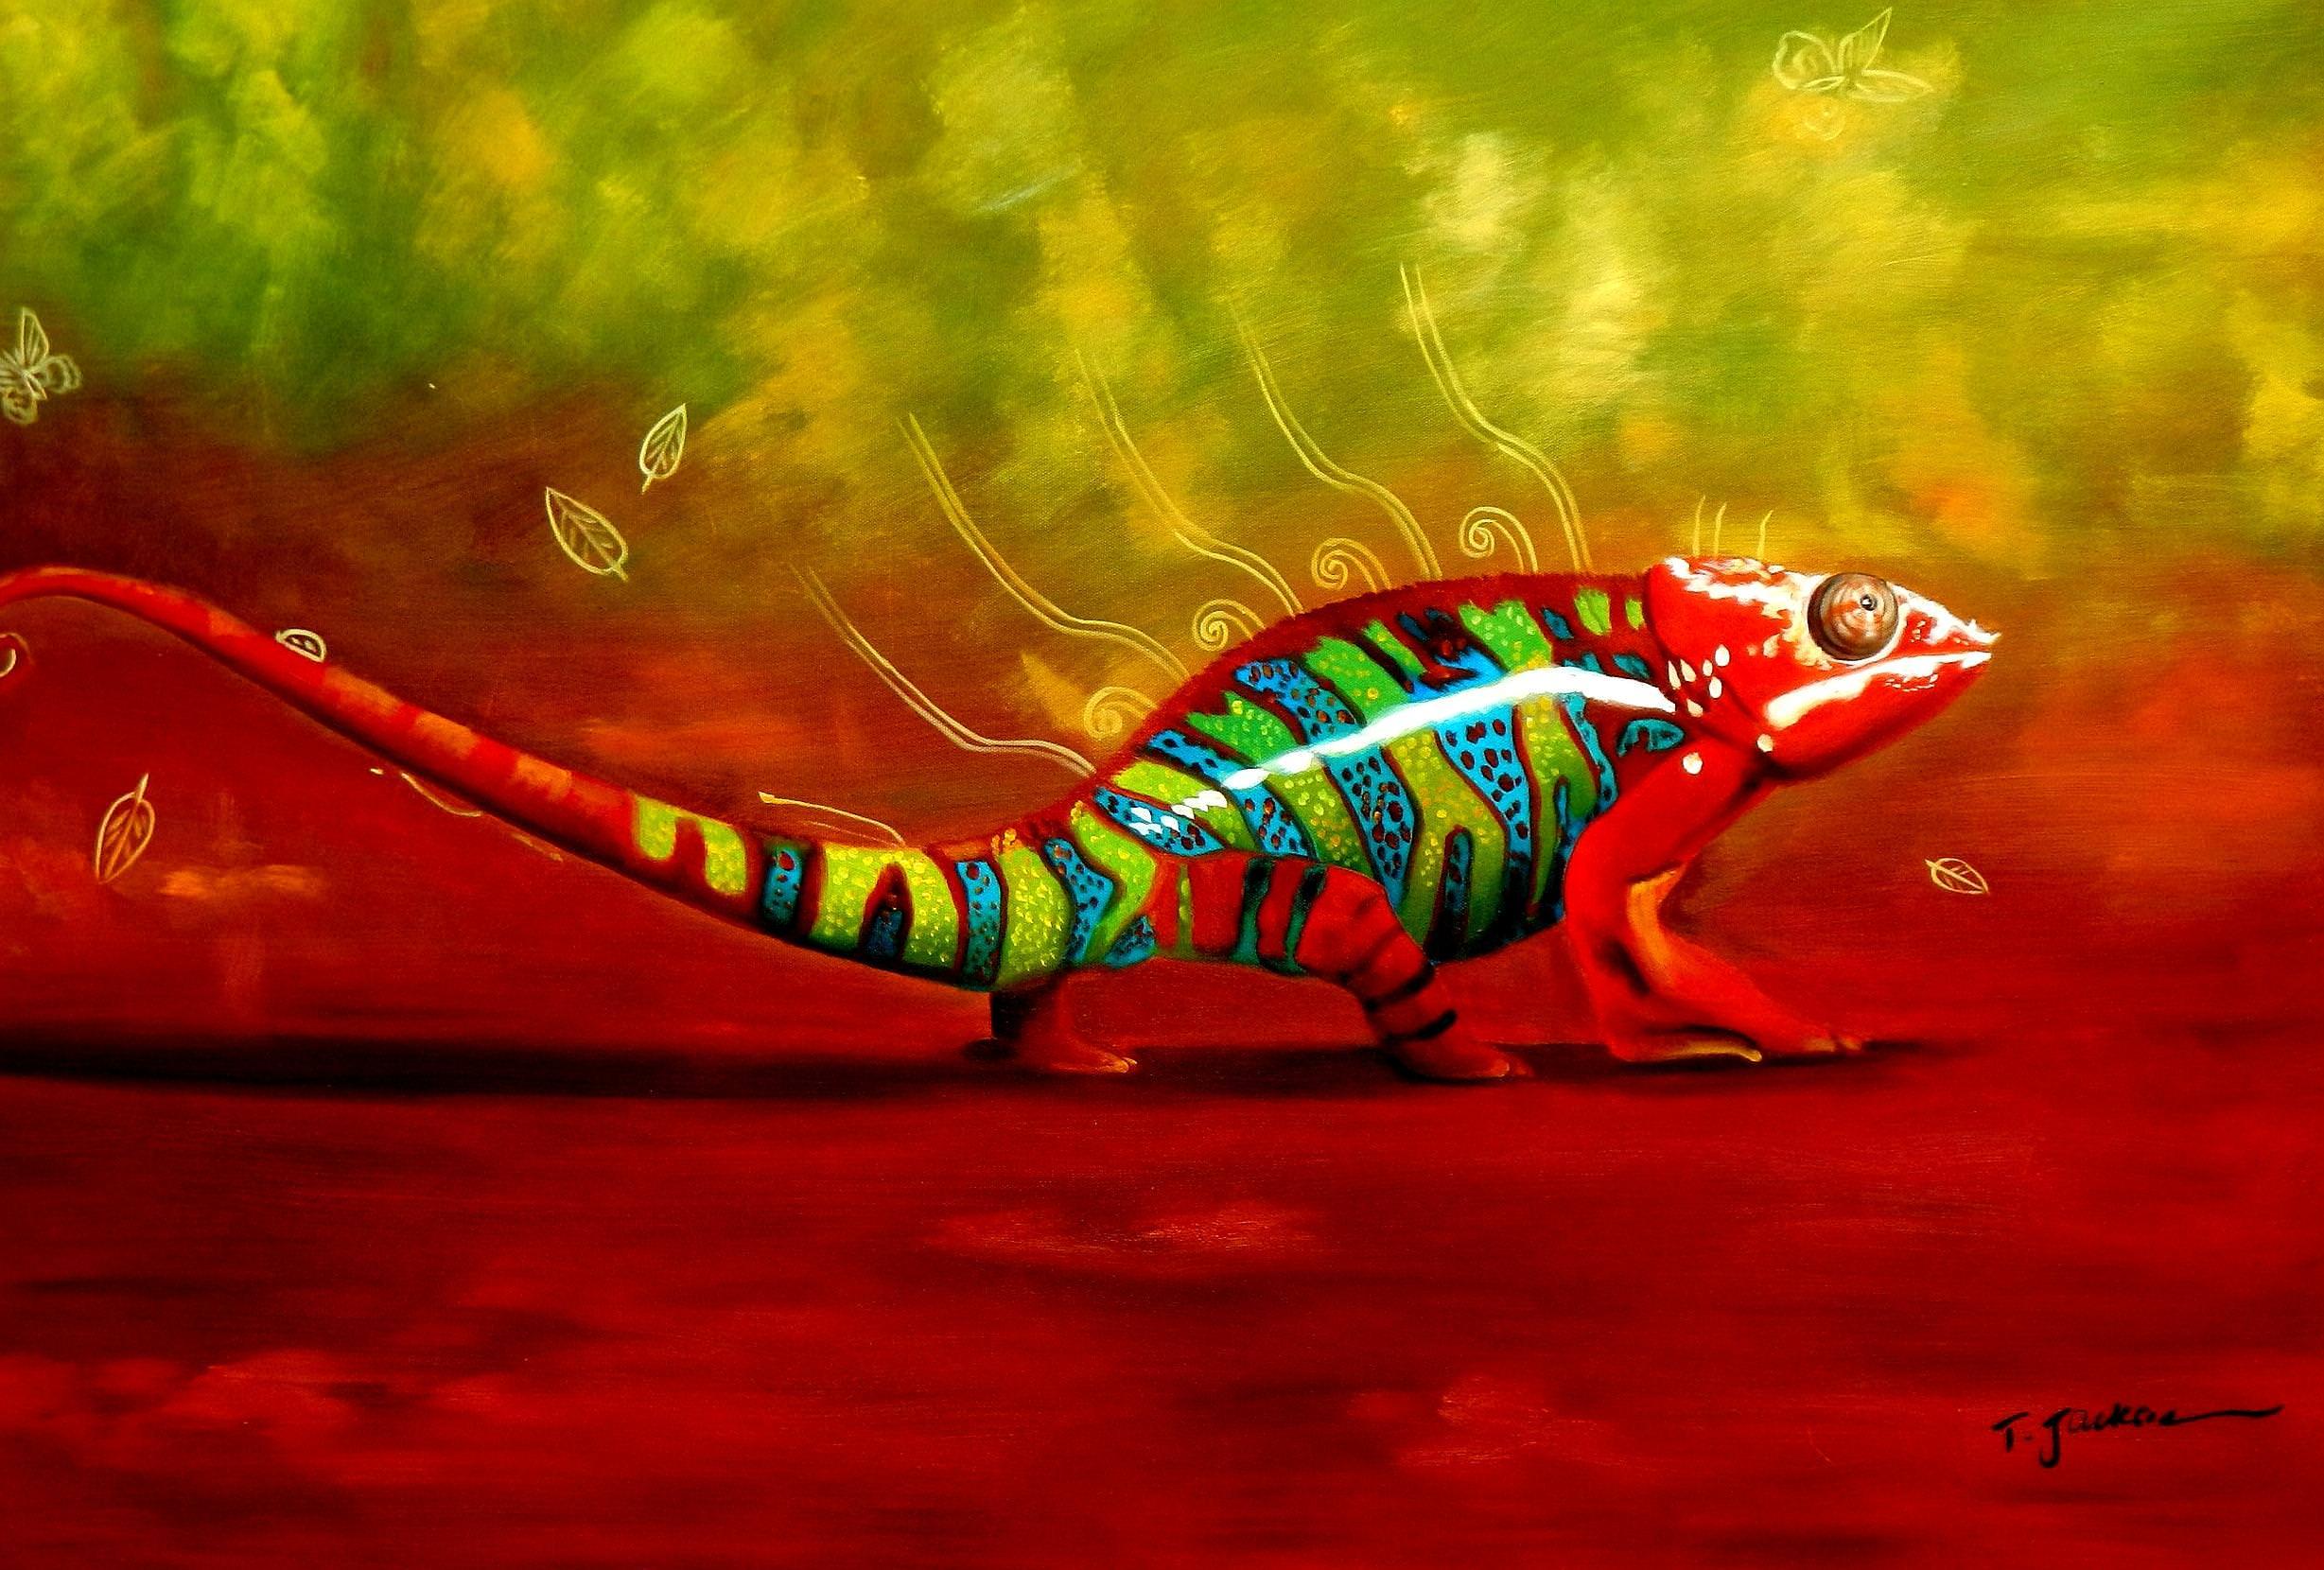 Modern Abstract - The colored chameleon d92915 60x90cm exzellentes Ölgemälde